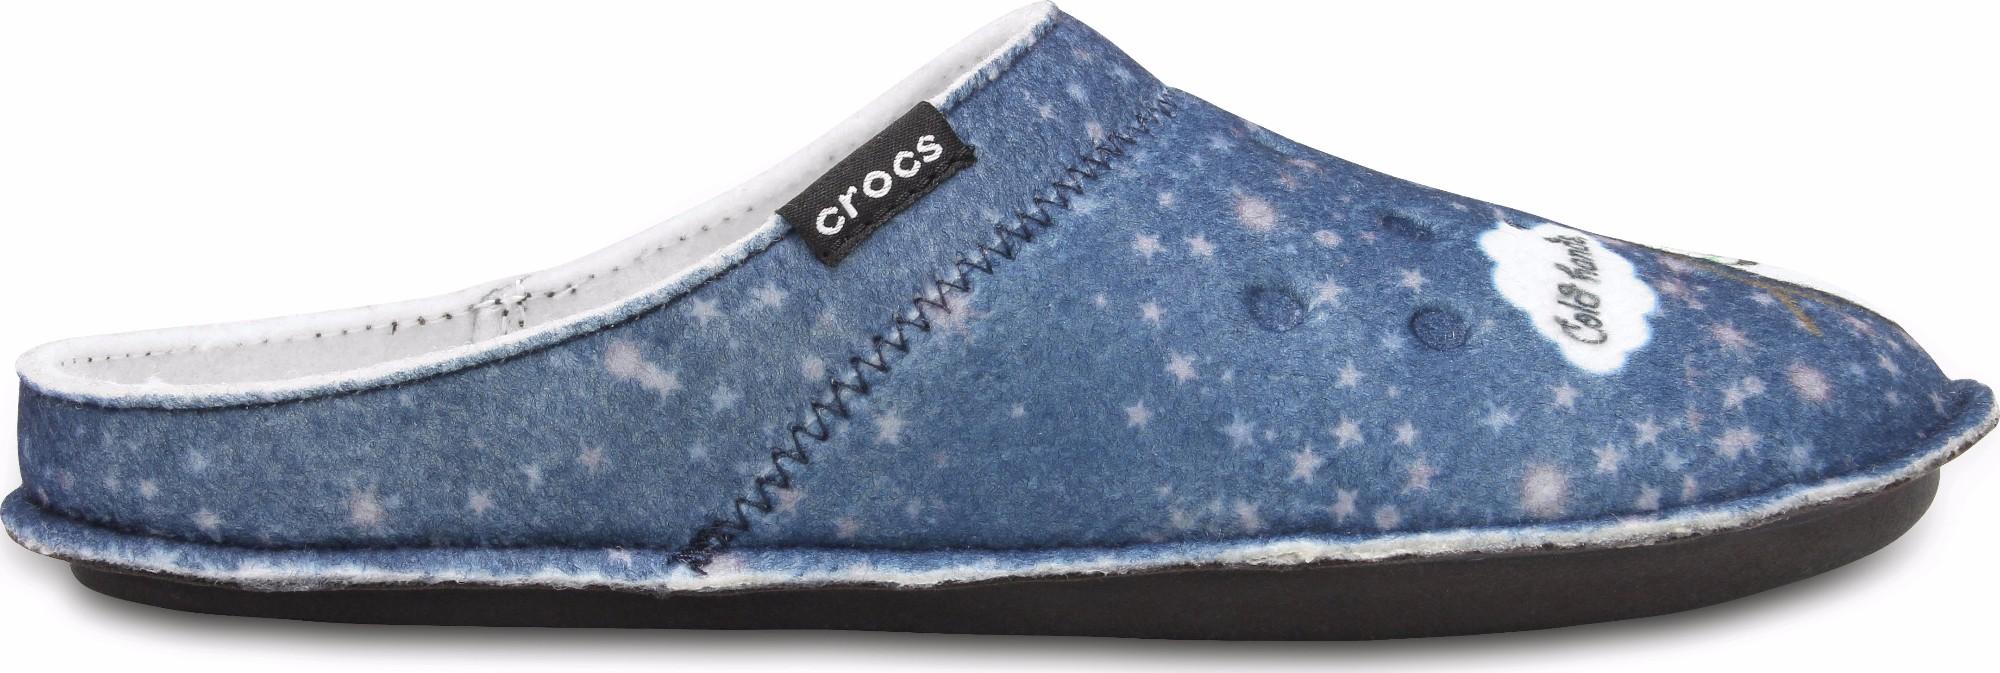 Crocs™ Classic Graphic Slipper Navy 41